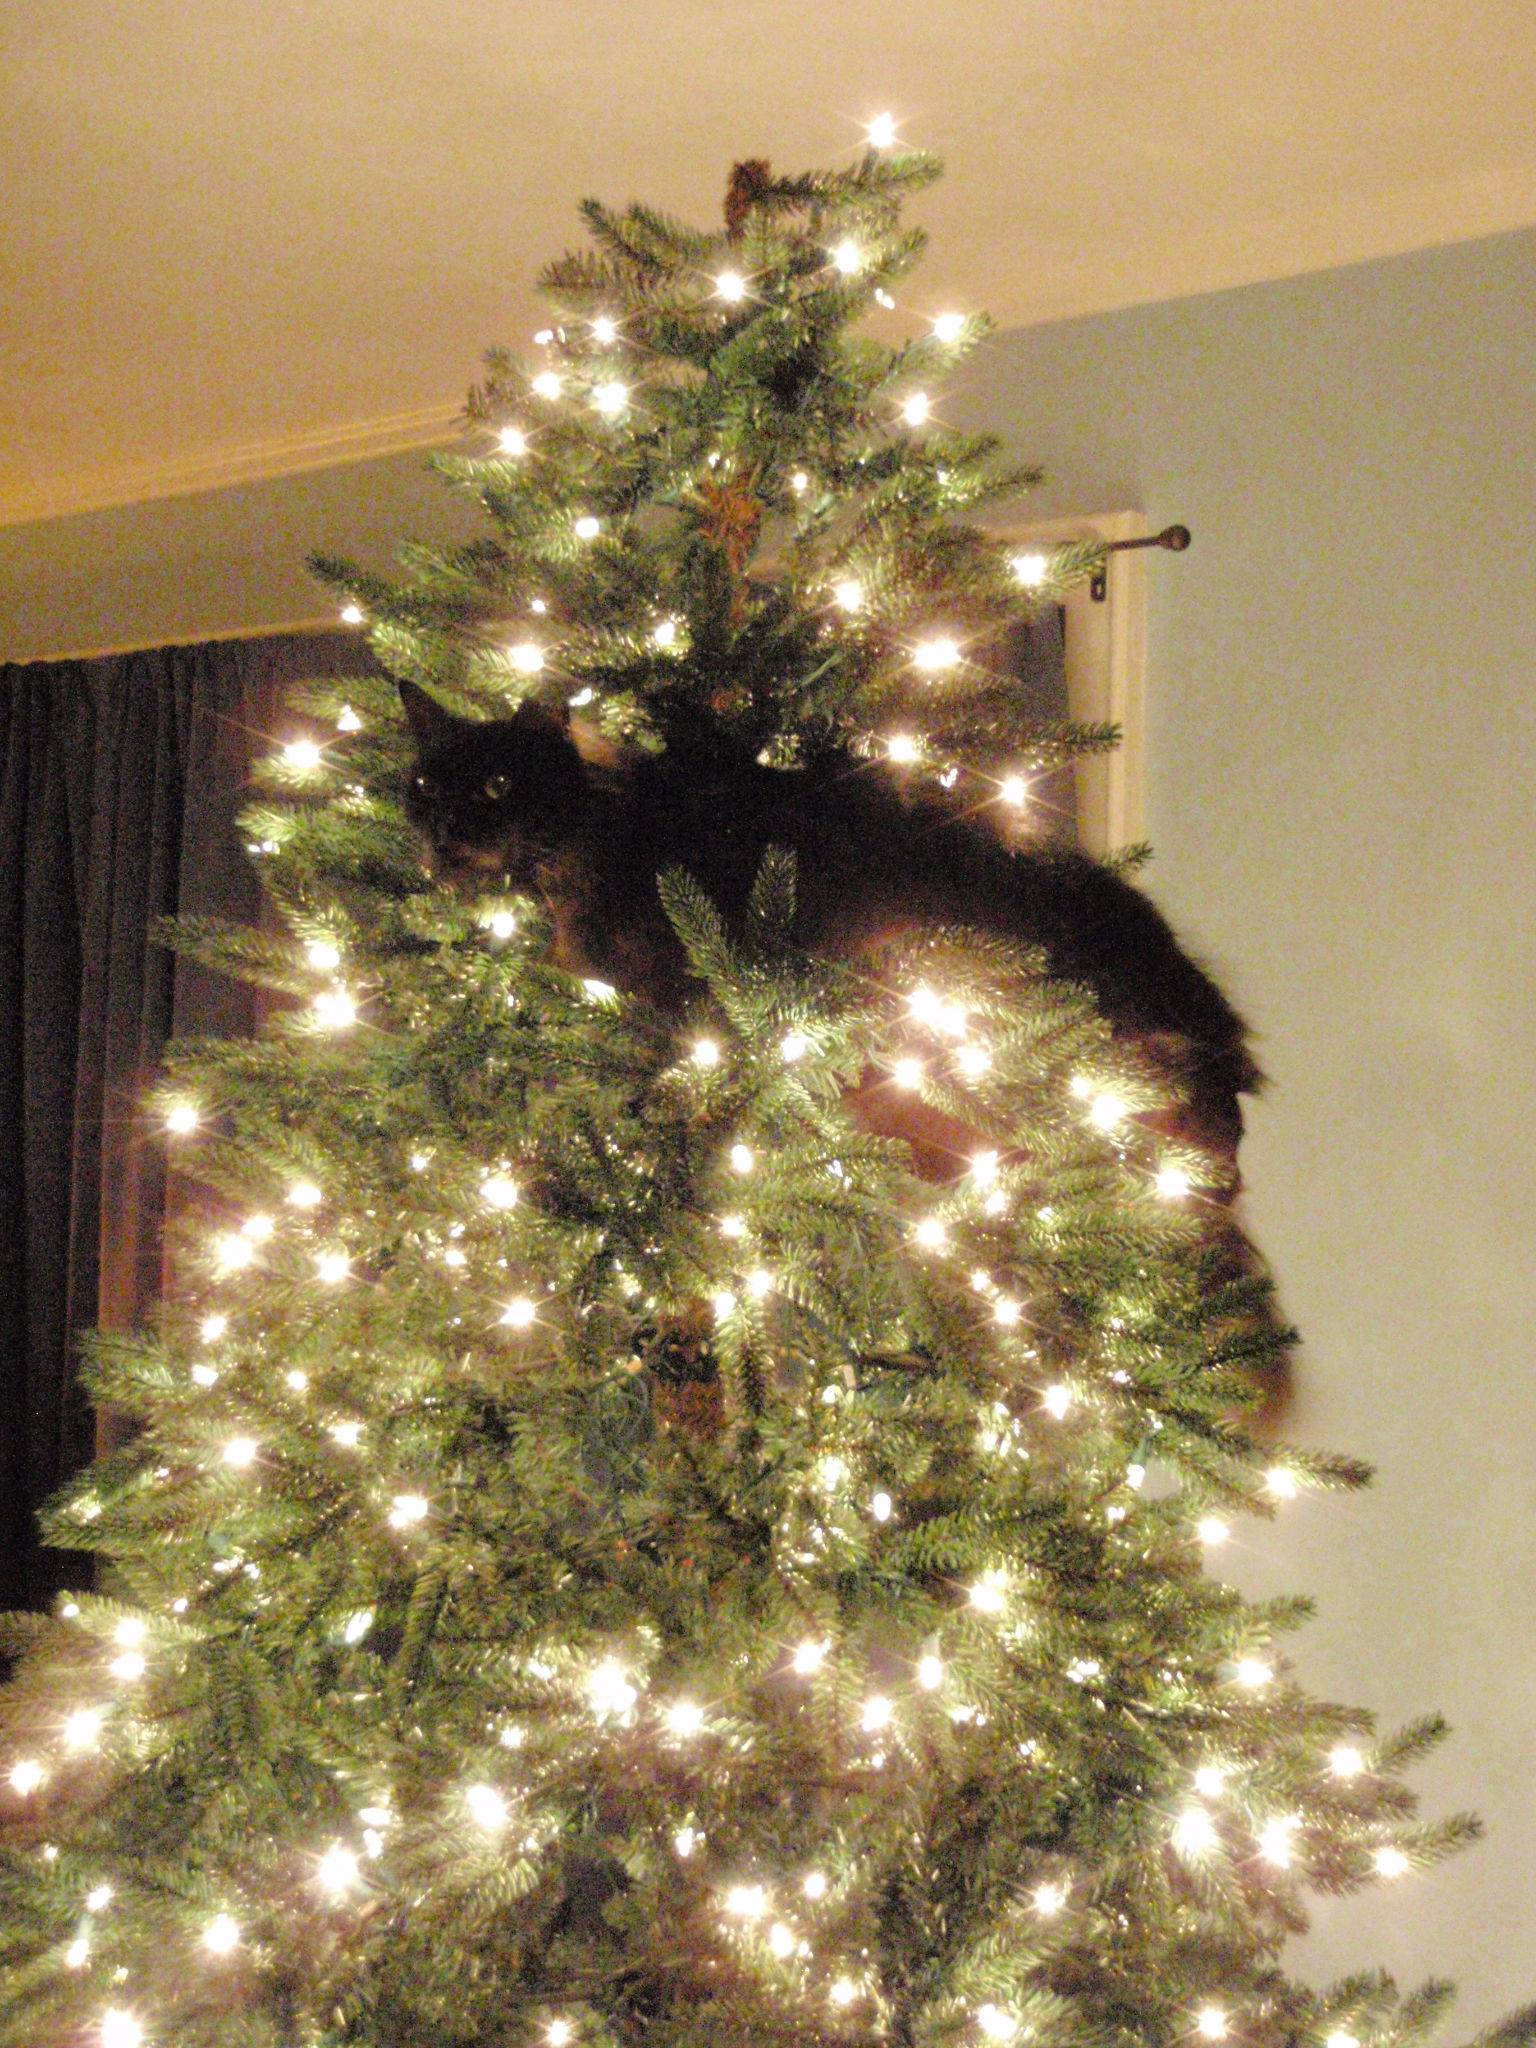 Cats Vs Christmas Trees.Cats And Christmas Trees Fuzzfeed